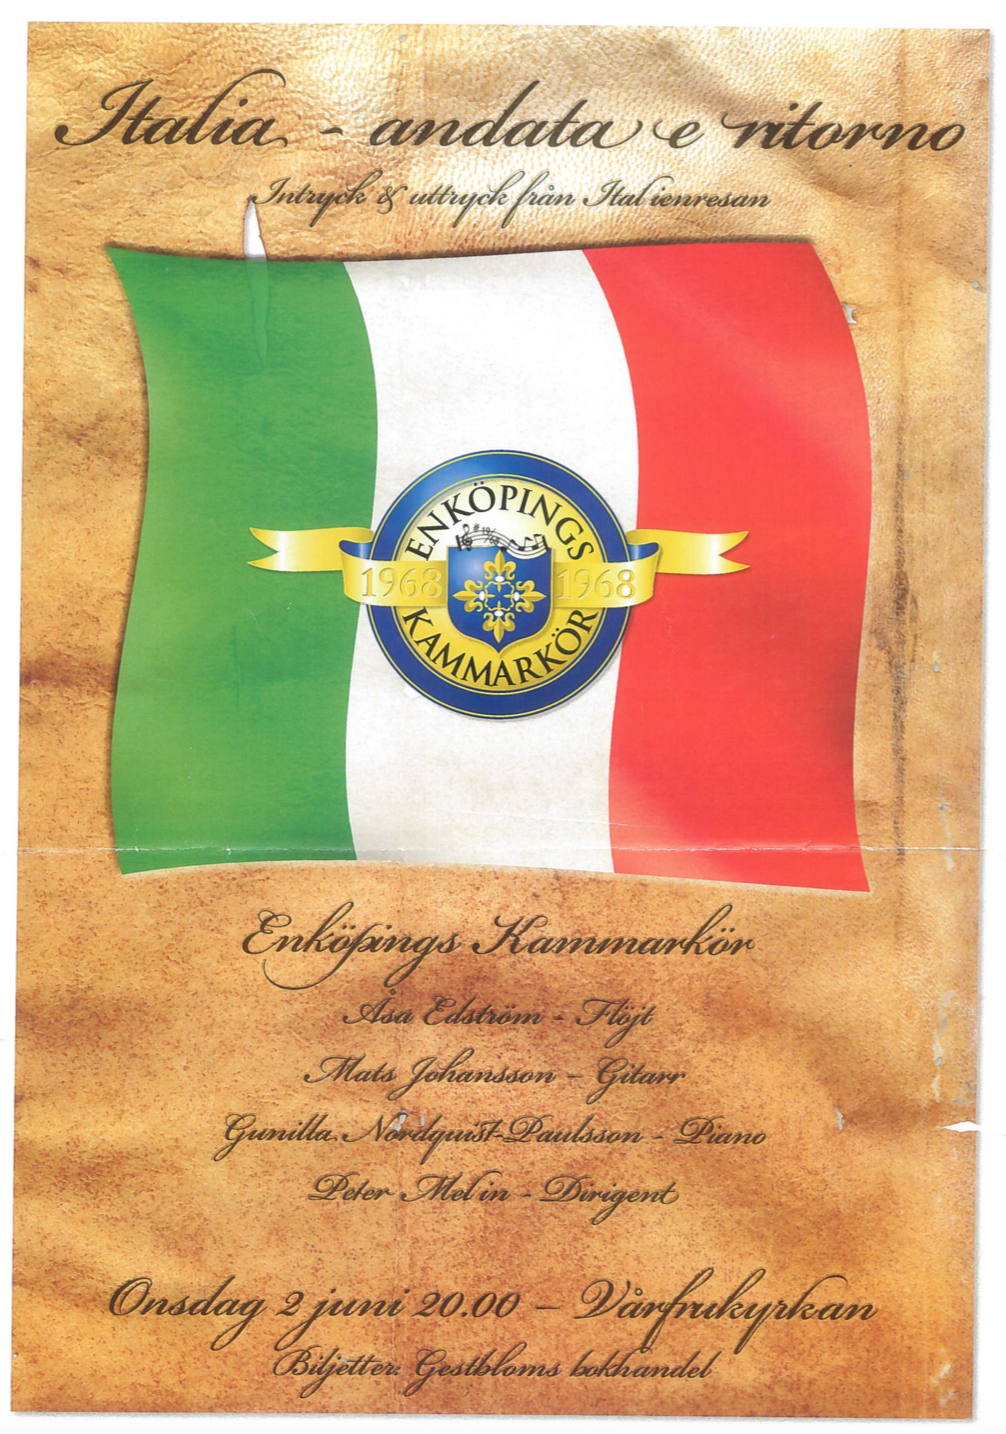 2010-affisch-italia-andata-e-ritorno-med-enkopings-kammarkor